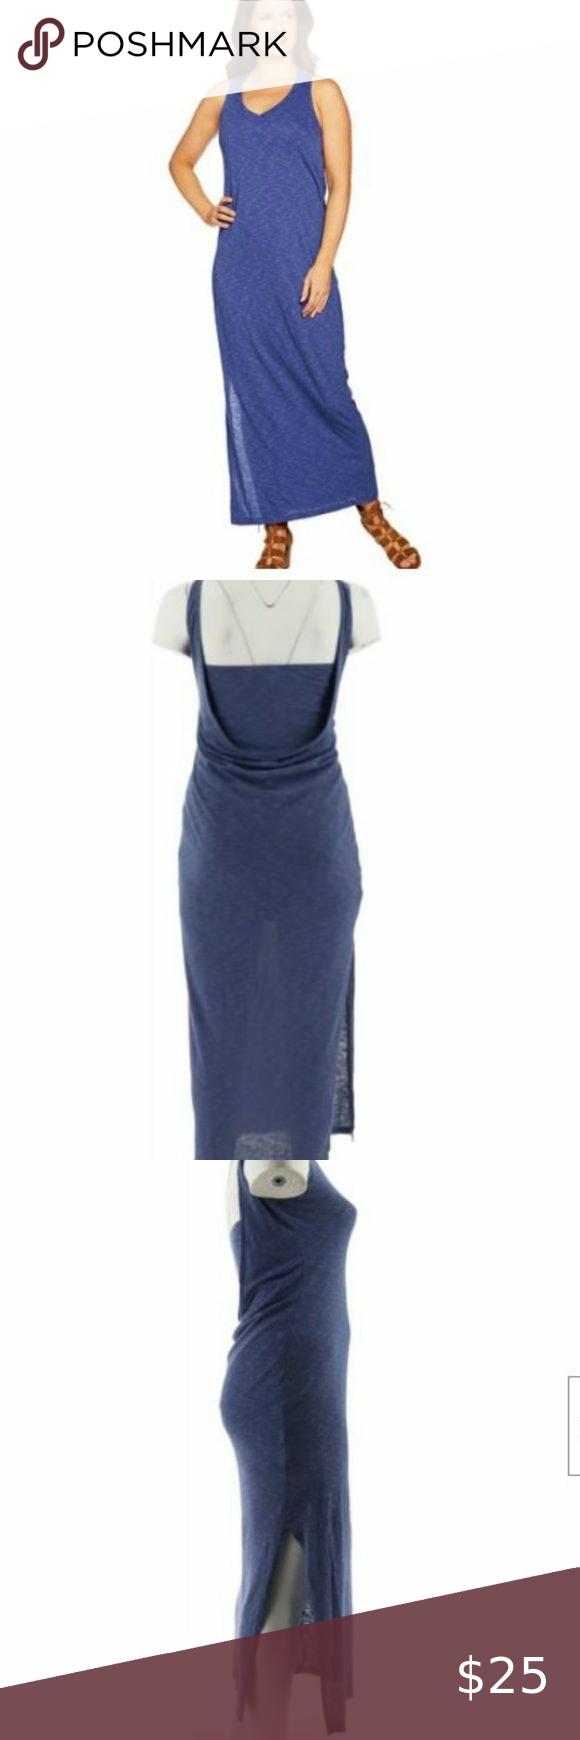 Peace Love World Drape Back Slub Knit Maxi Dress Maxi Knit Dress Slub Knit Maxi Dress [ 1740 x 580 Pixel ]